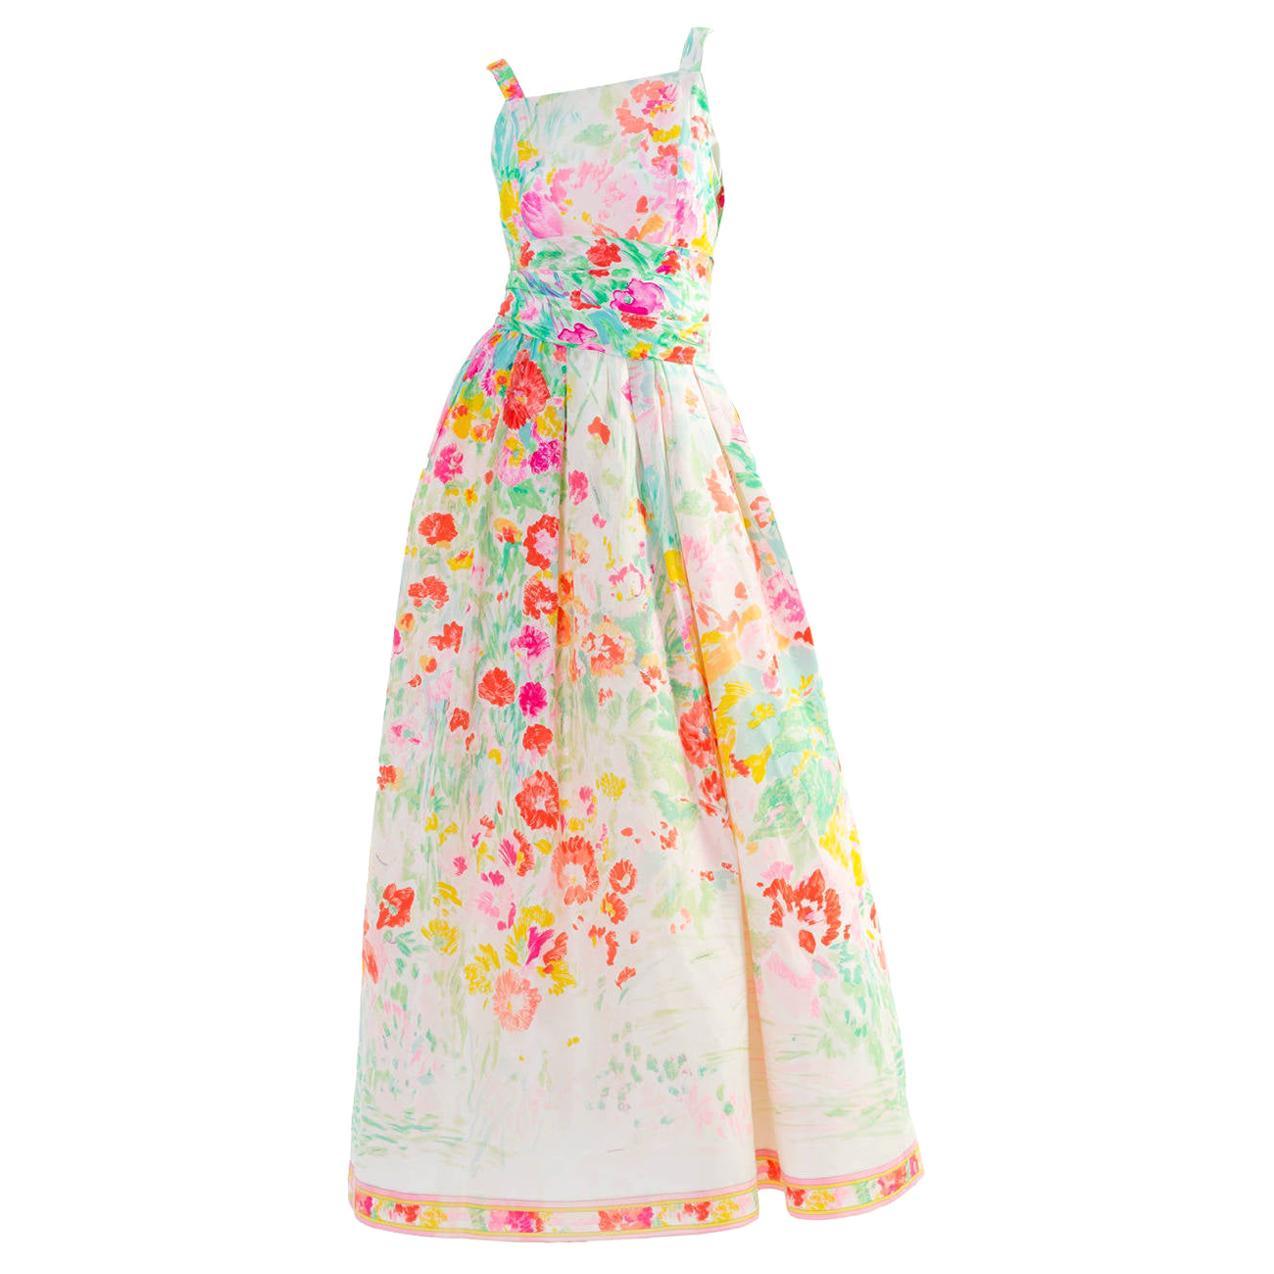 Leonard Paris Multicolor Florals Silk Sleeveless Maxi Dress Gown, 1990s